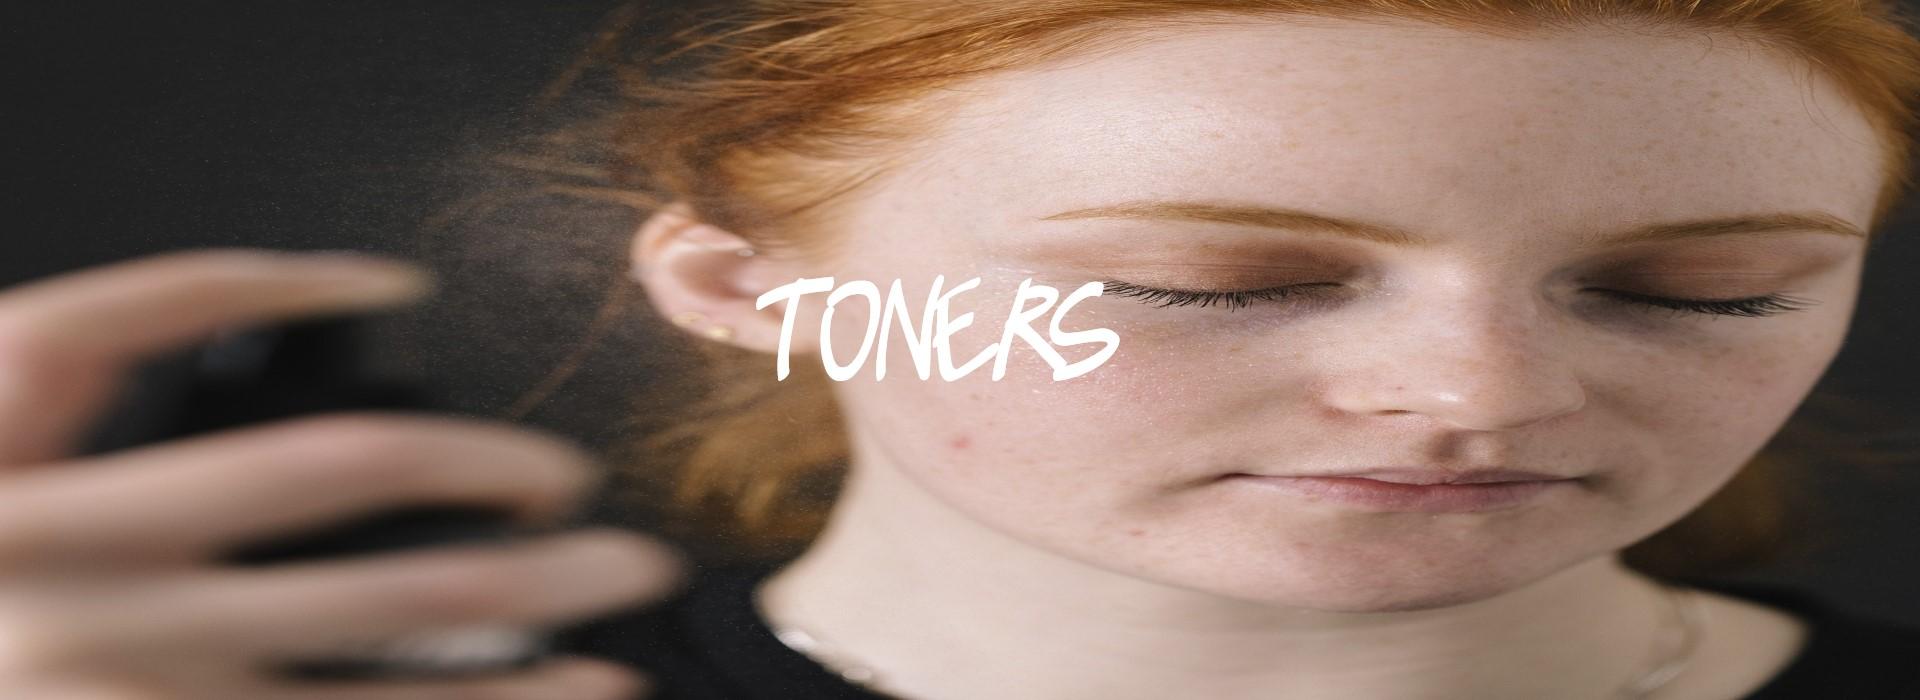 Toners